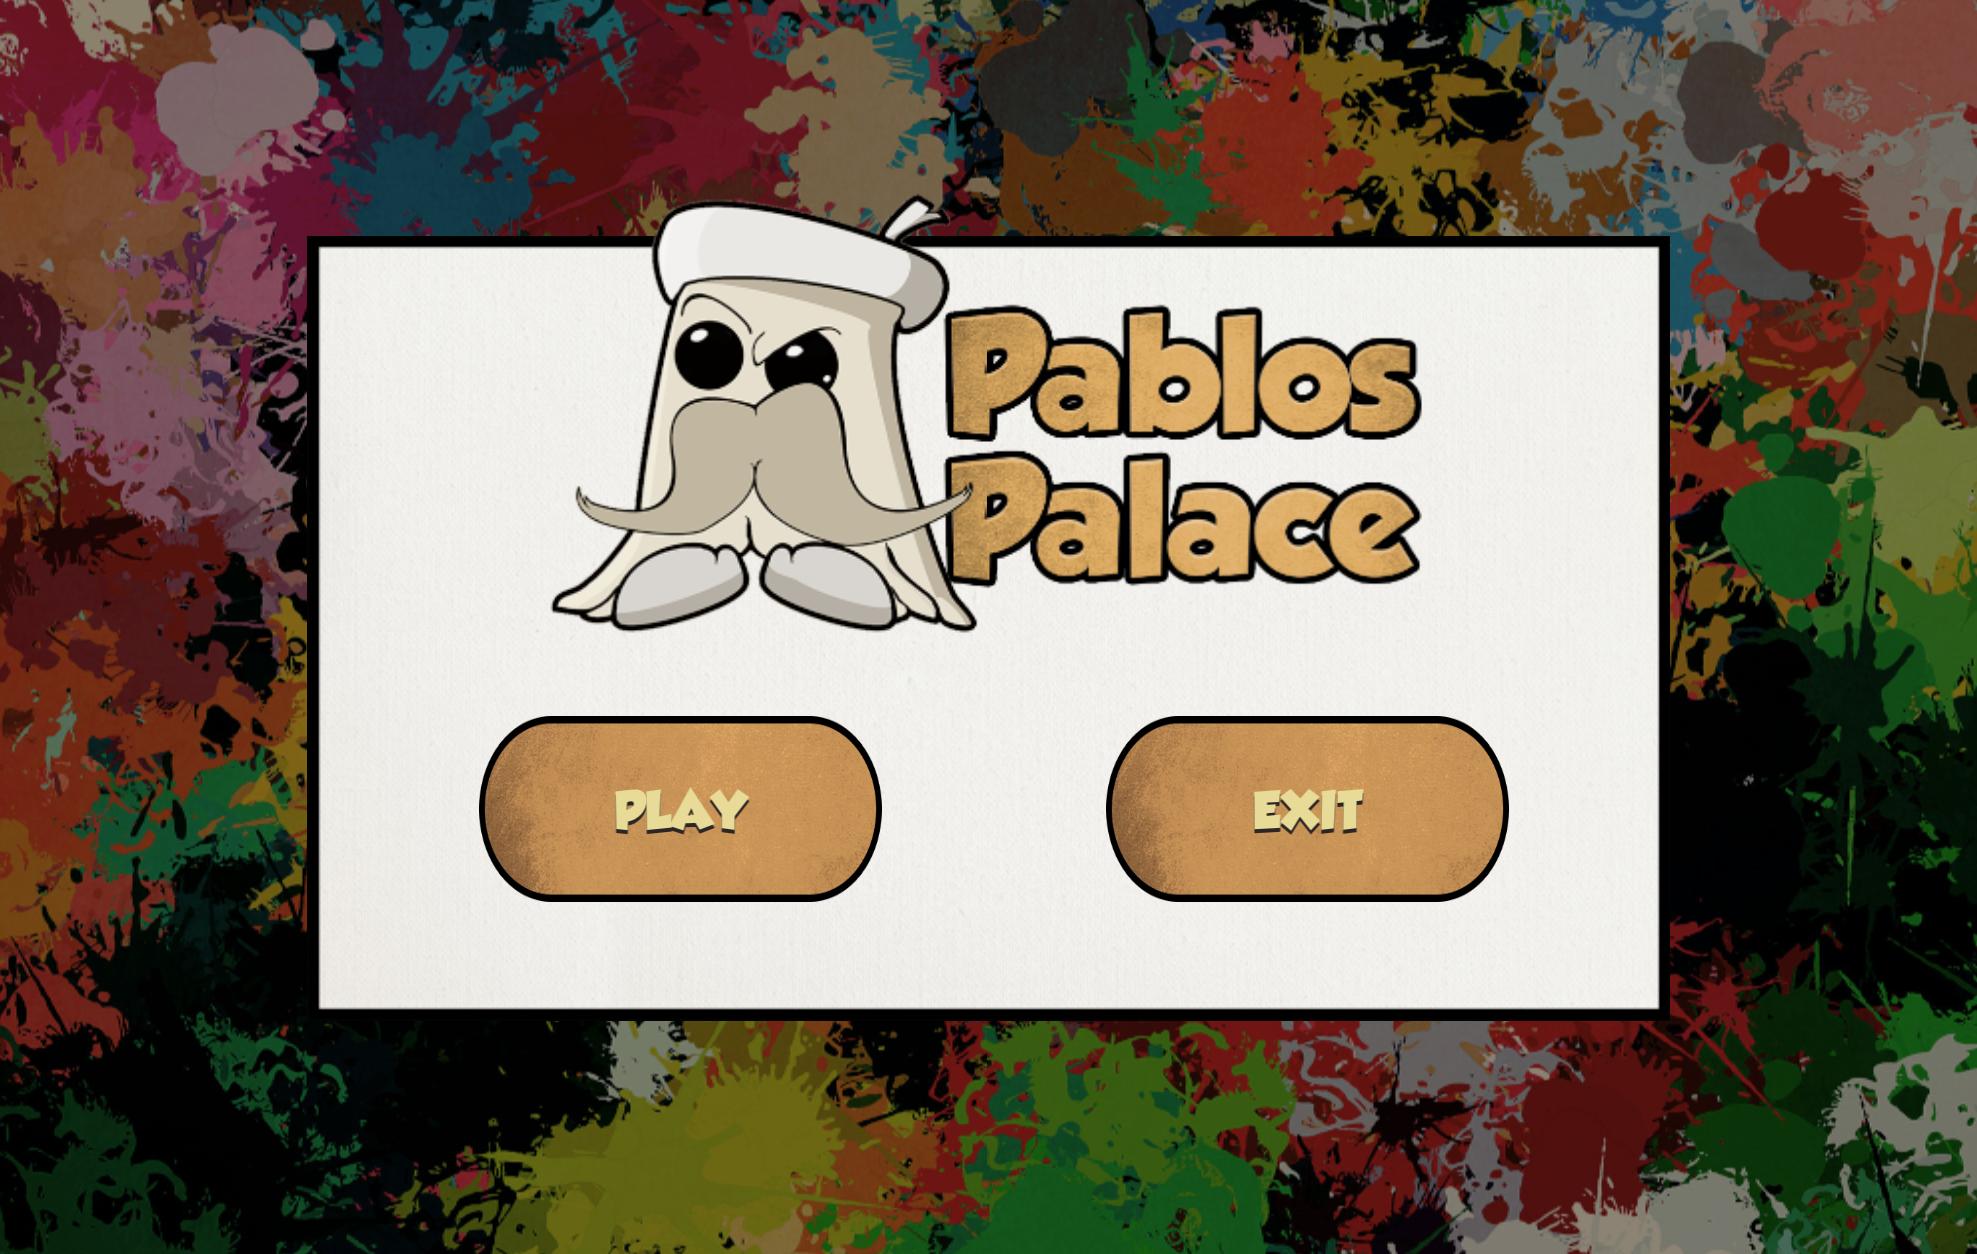 Pablo's Palace